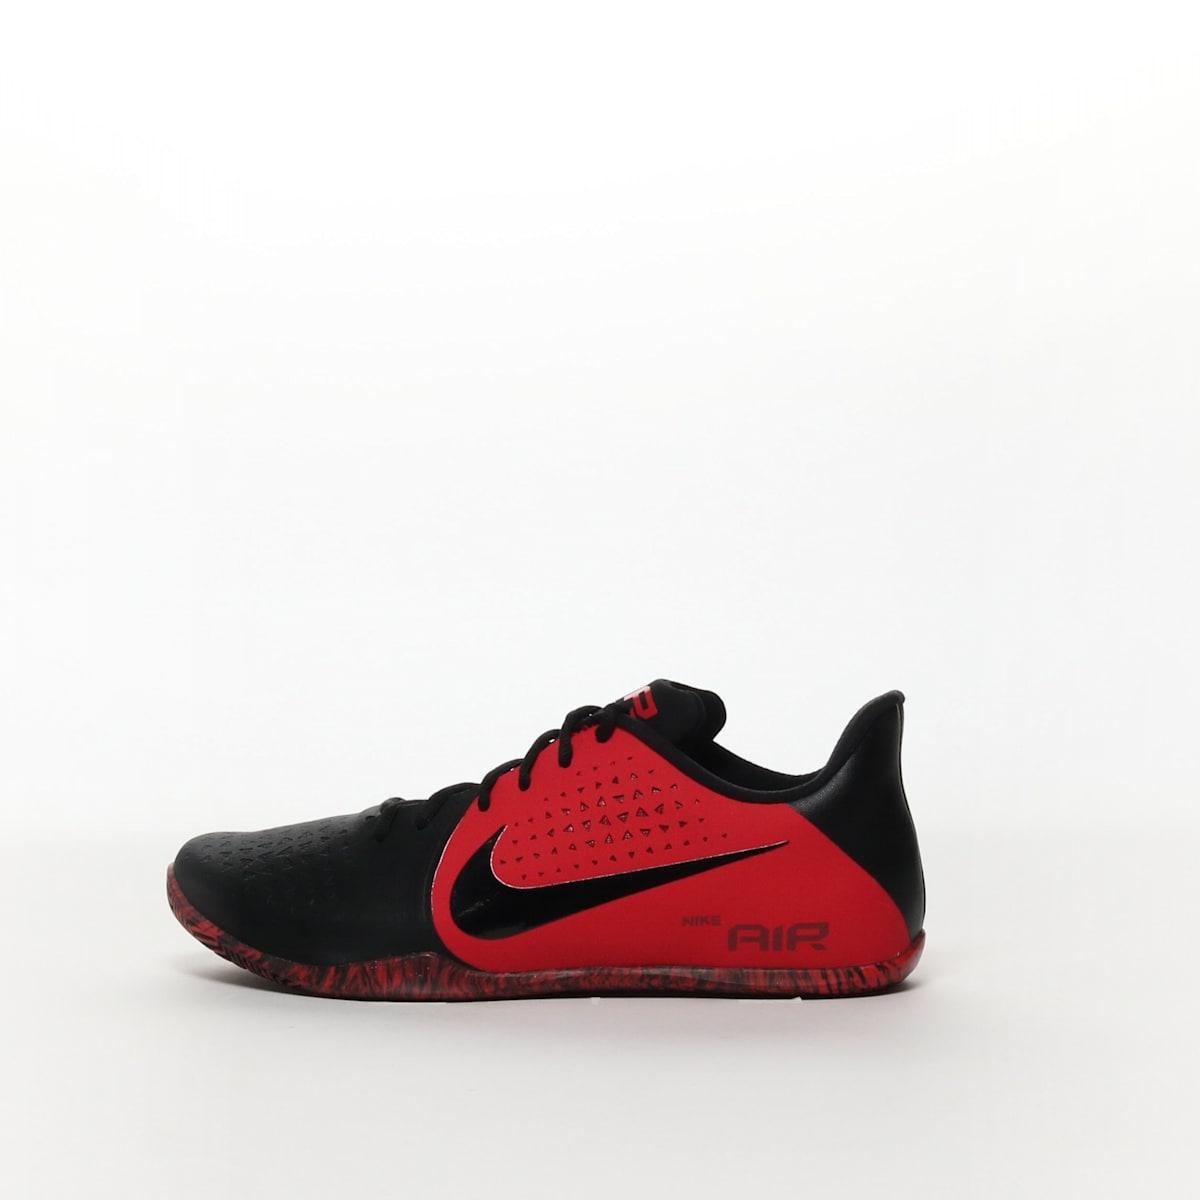 89ea03757814 Men s Nike Air Behold Low Basketball Shoe - UNVRED BLACK – Resku